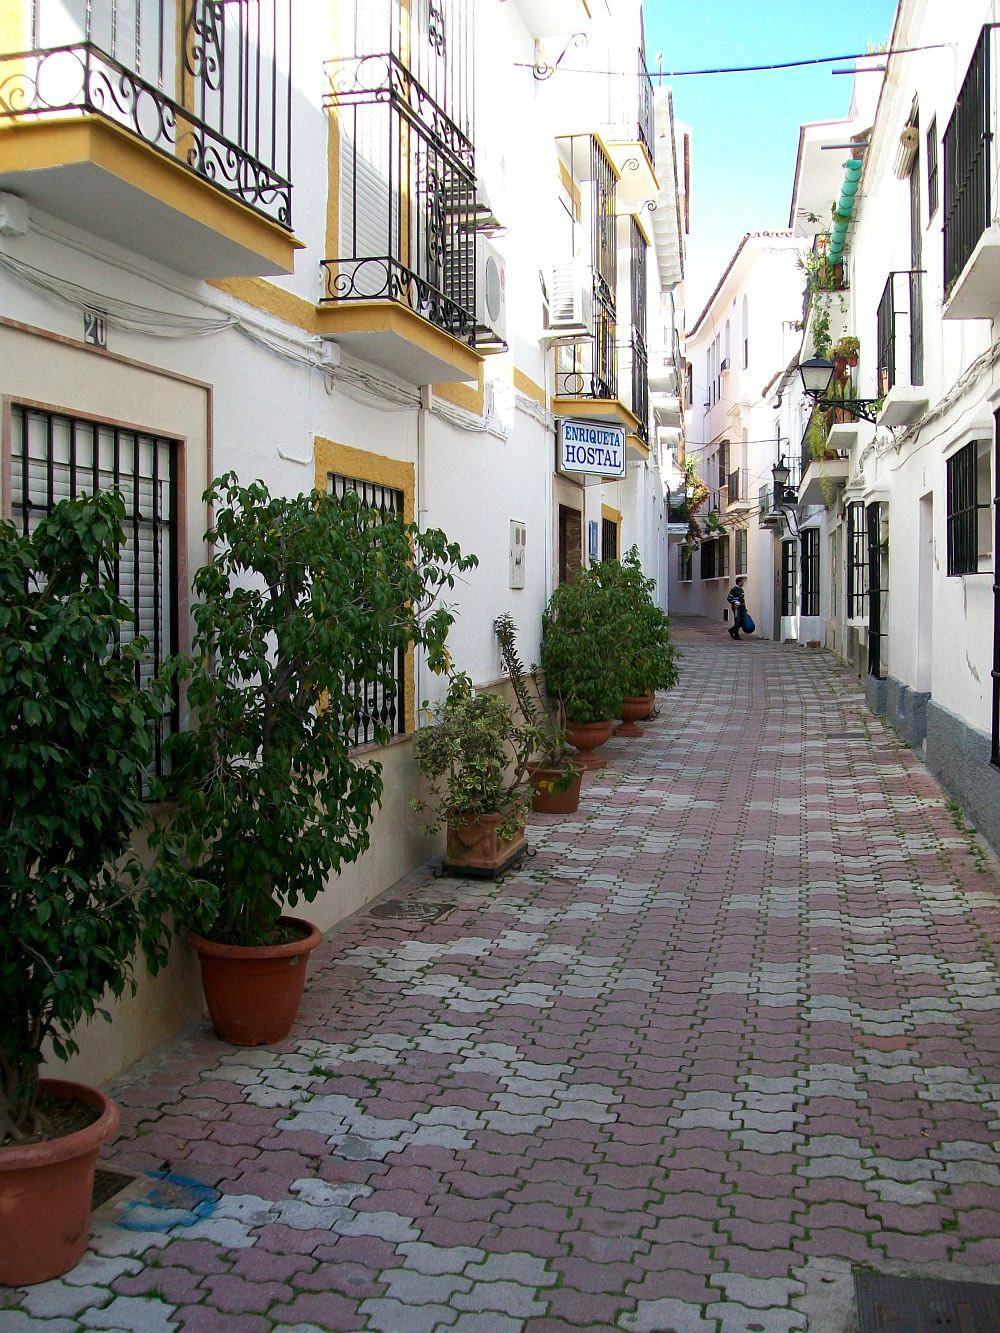 Hostel in Marbella Old Town